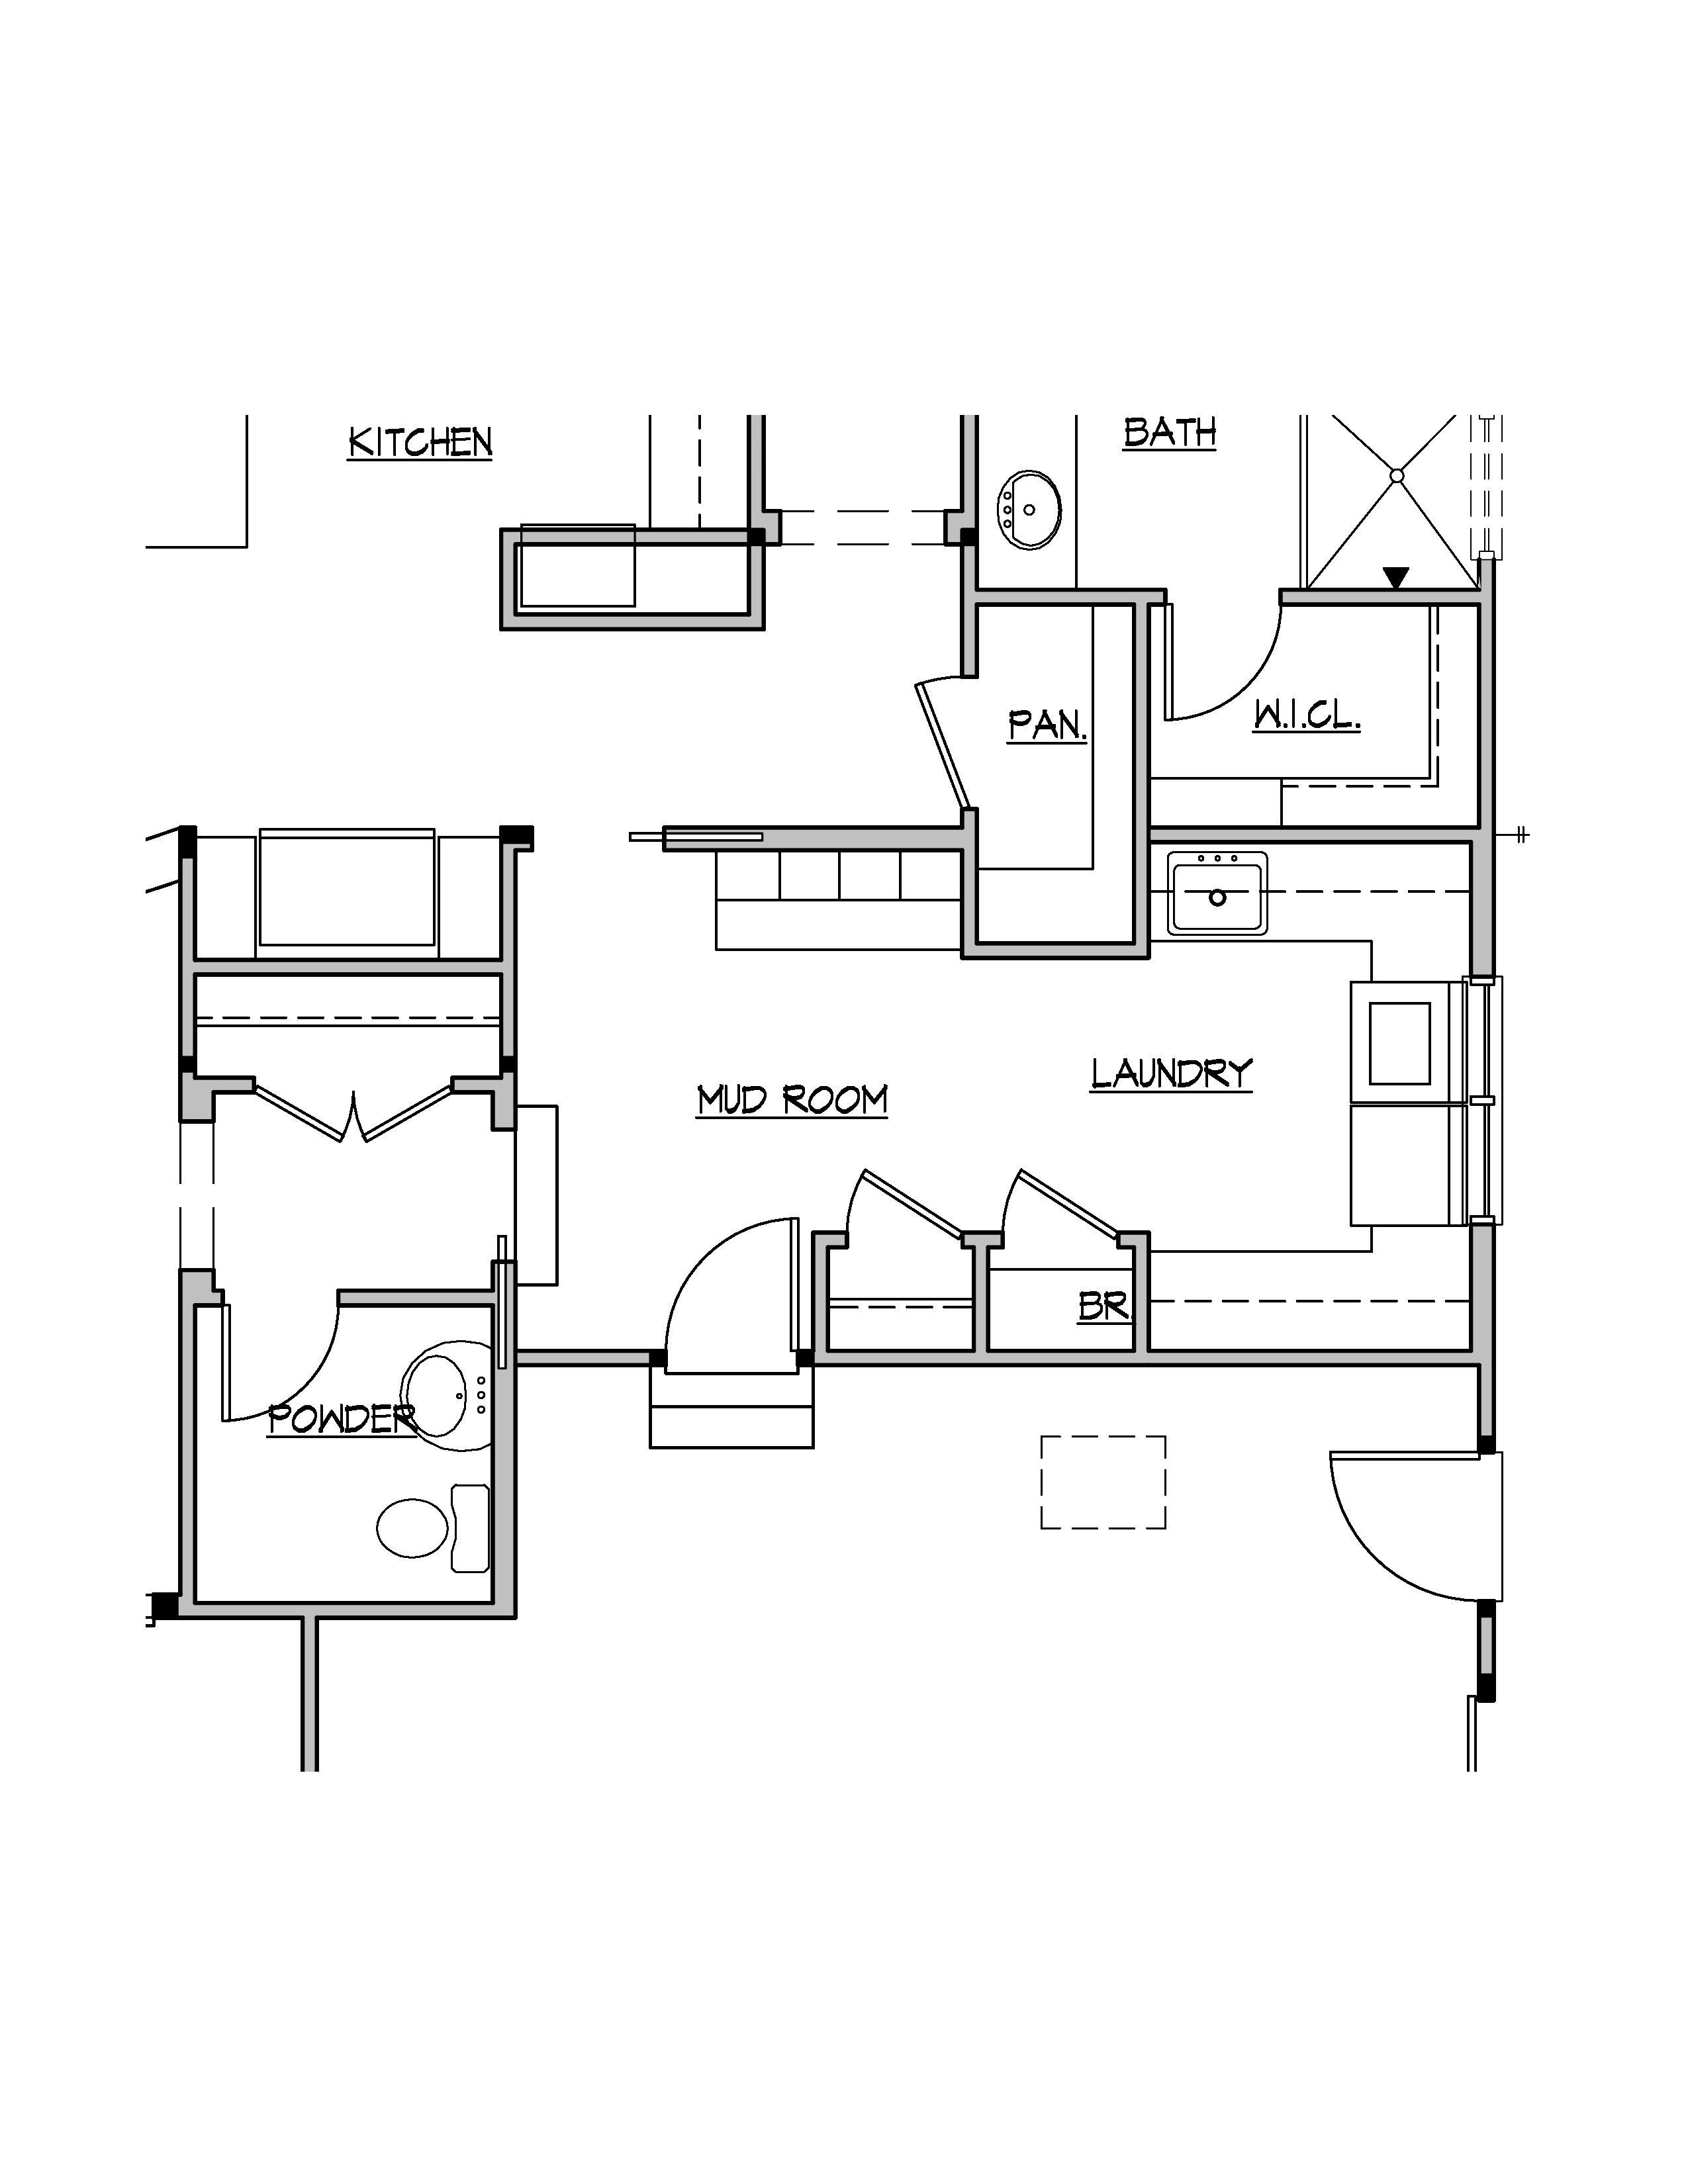 Laundry Room Plans Layouts Duwet Room Layout Design Laundry Room Layouts Room Layout Planner